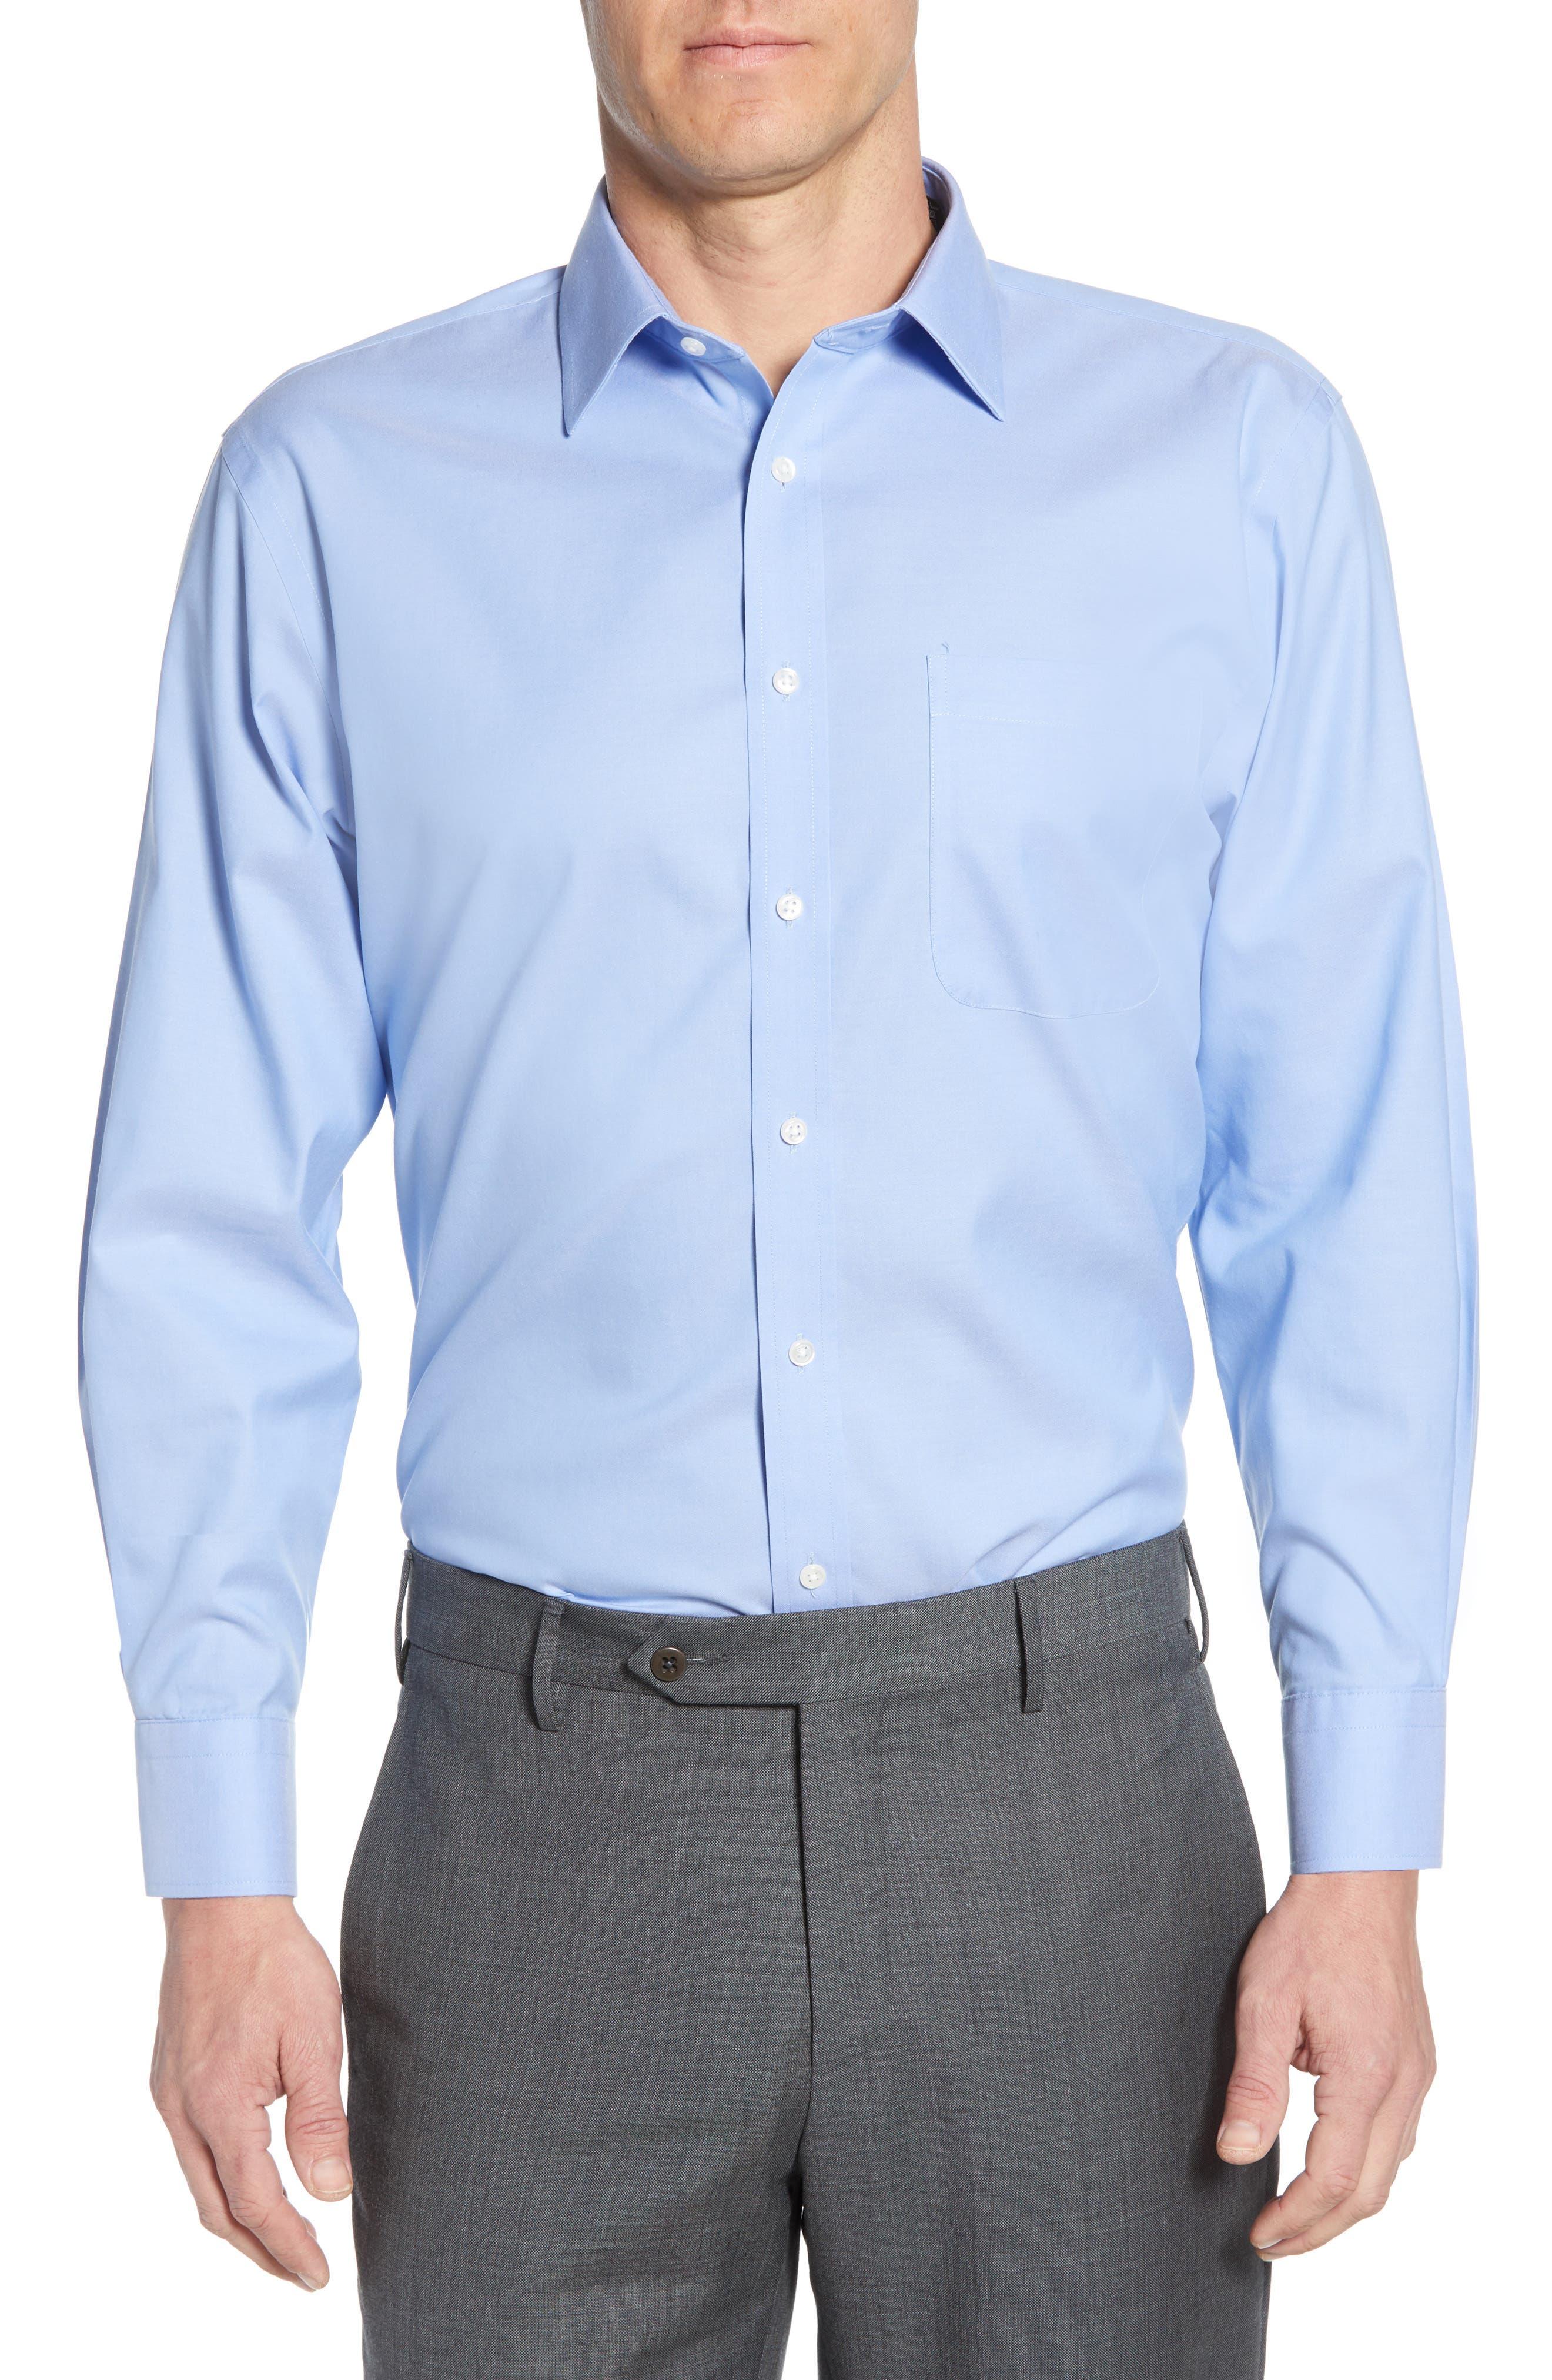 Nordstrom Shop Smartcare(TM) Traditional Fit Dress Shirt - Blue